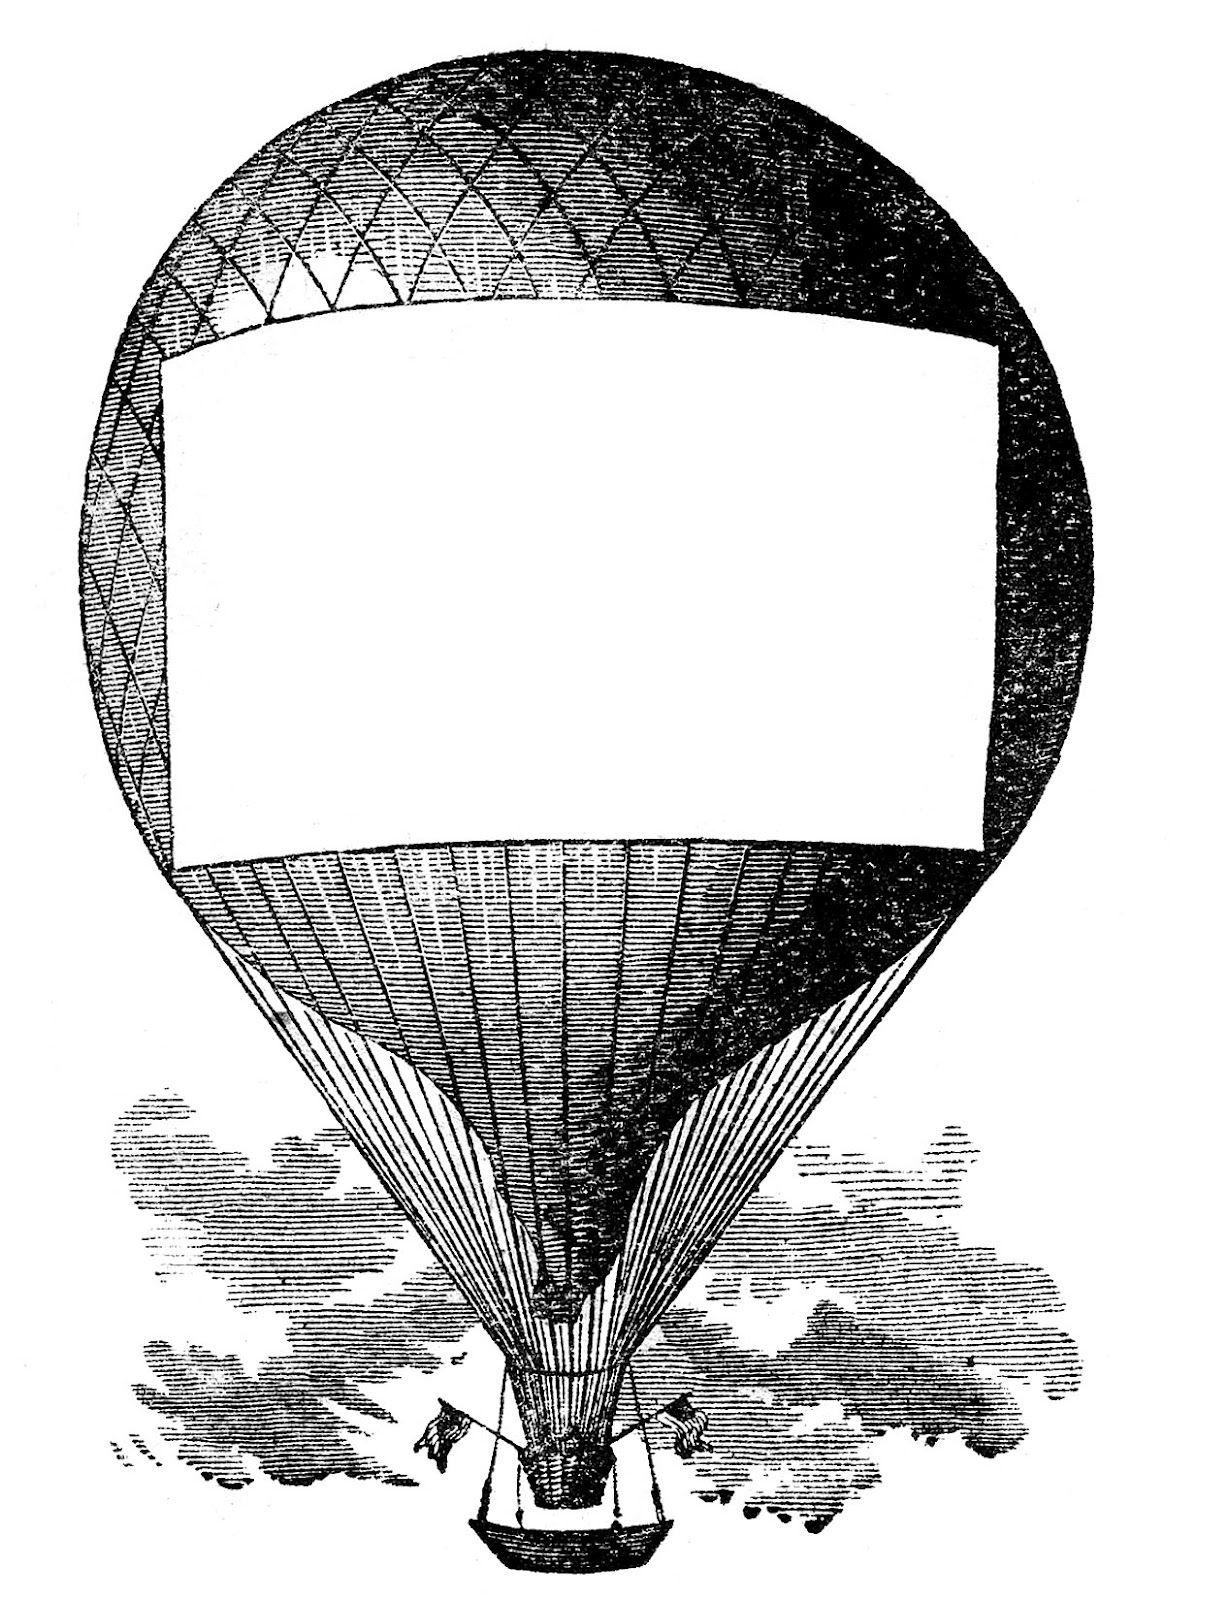 Advertising Clip Art - Hot Air Balloon - Steampunk   Graphics fairy ...